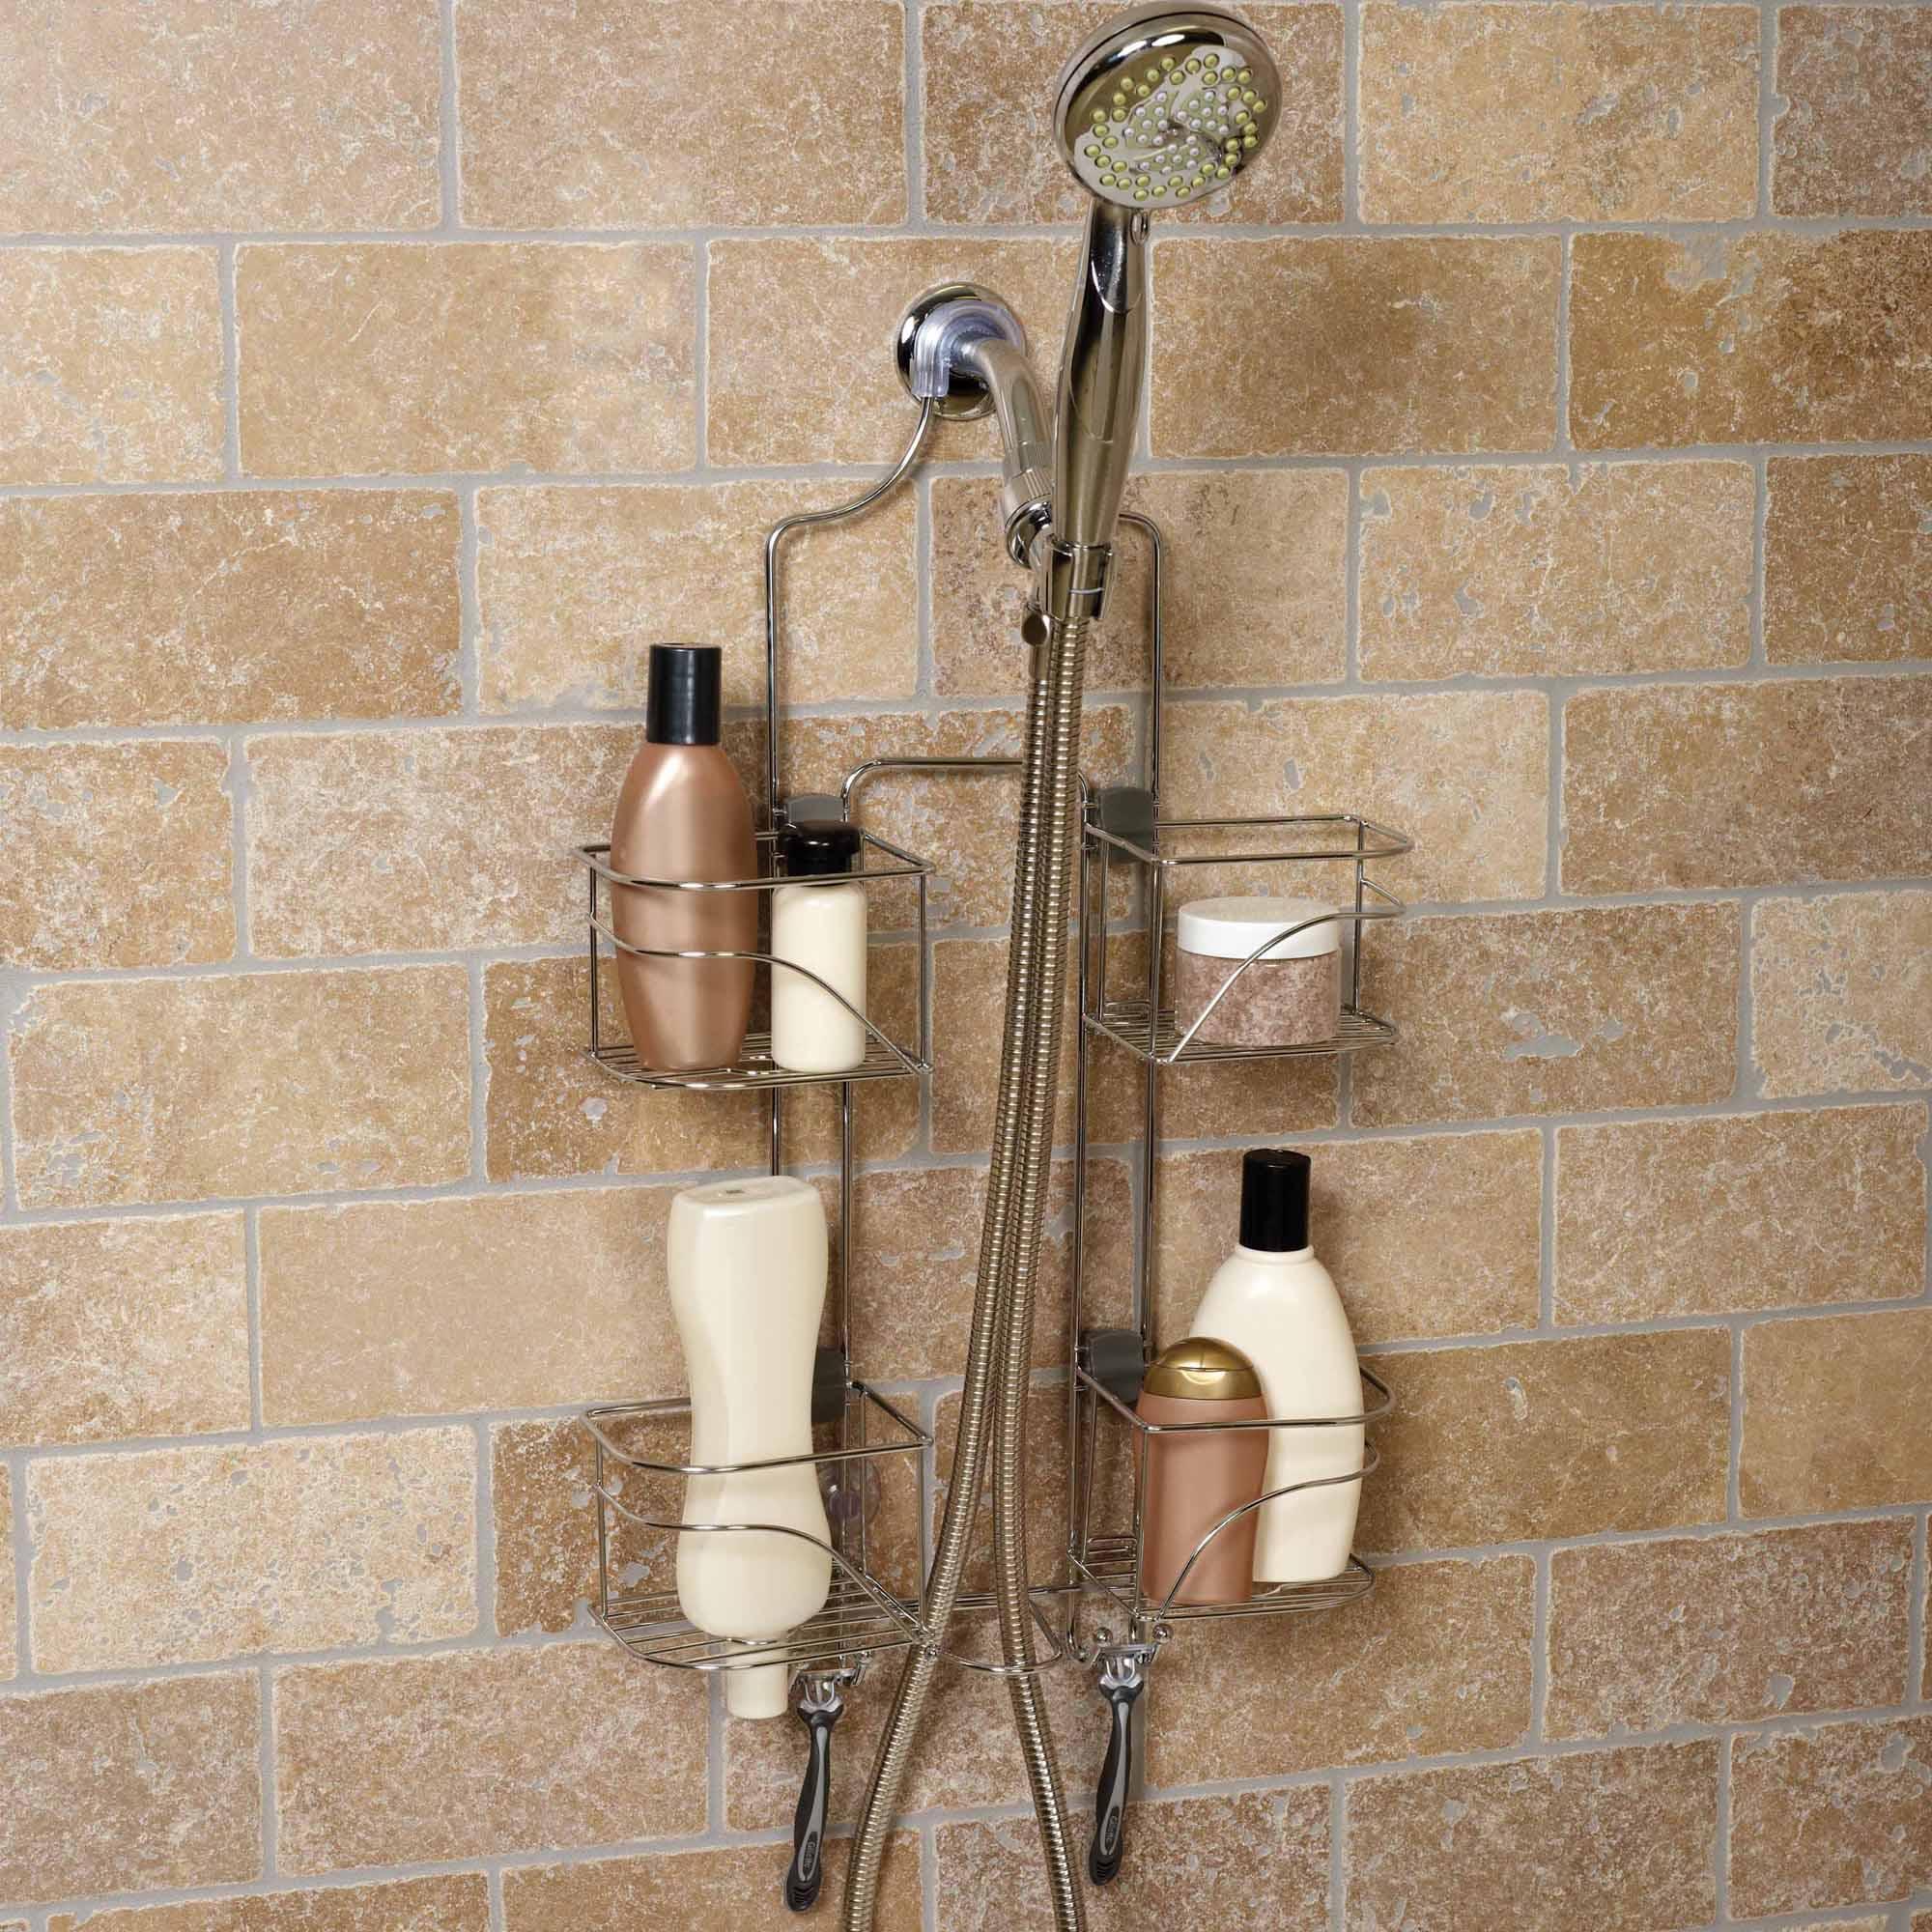 Chapter Expanding Shower Caddy, Chrome - Walmart.com